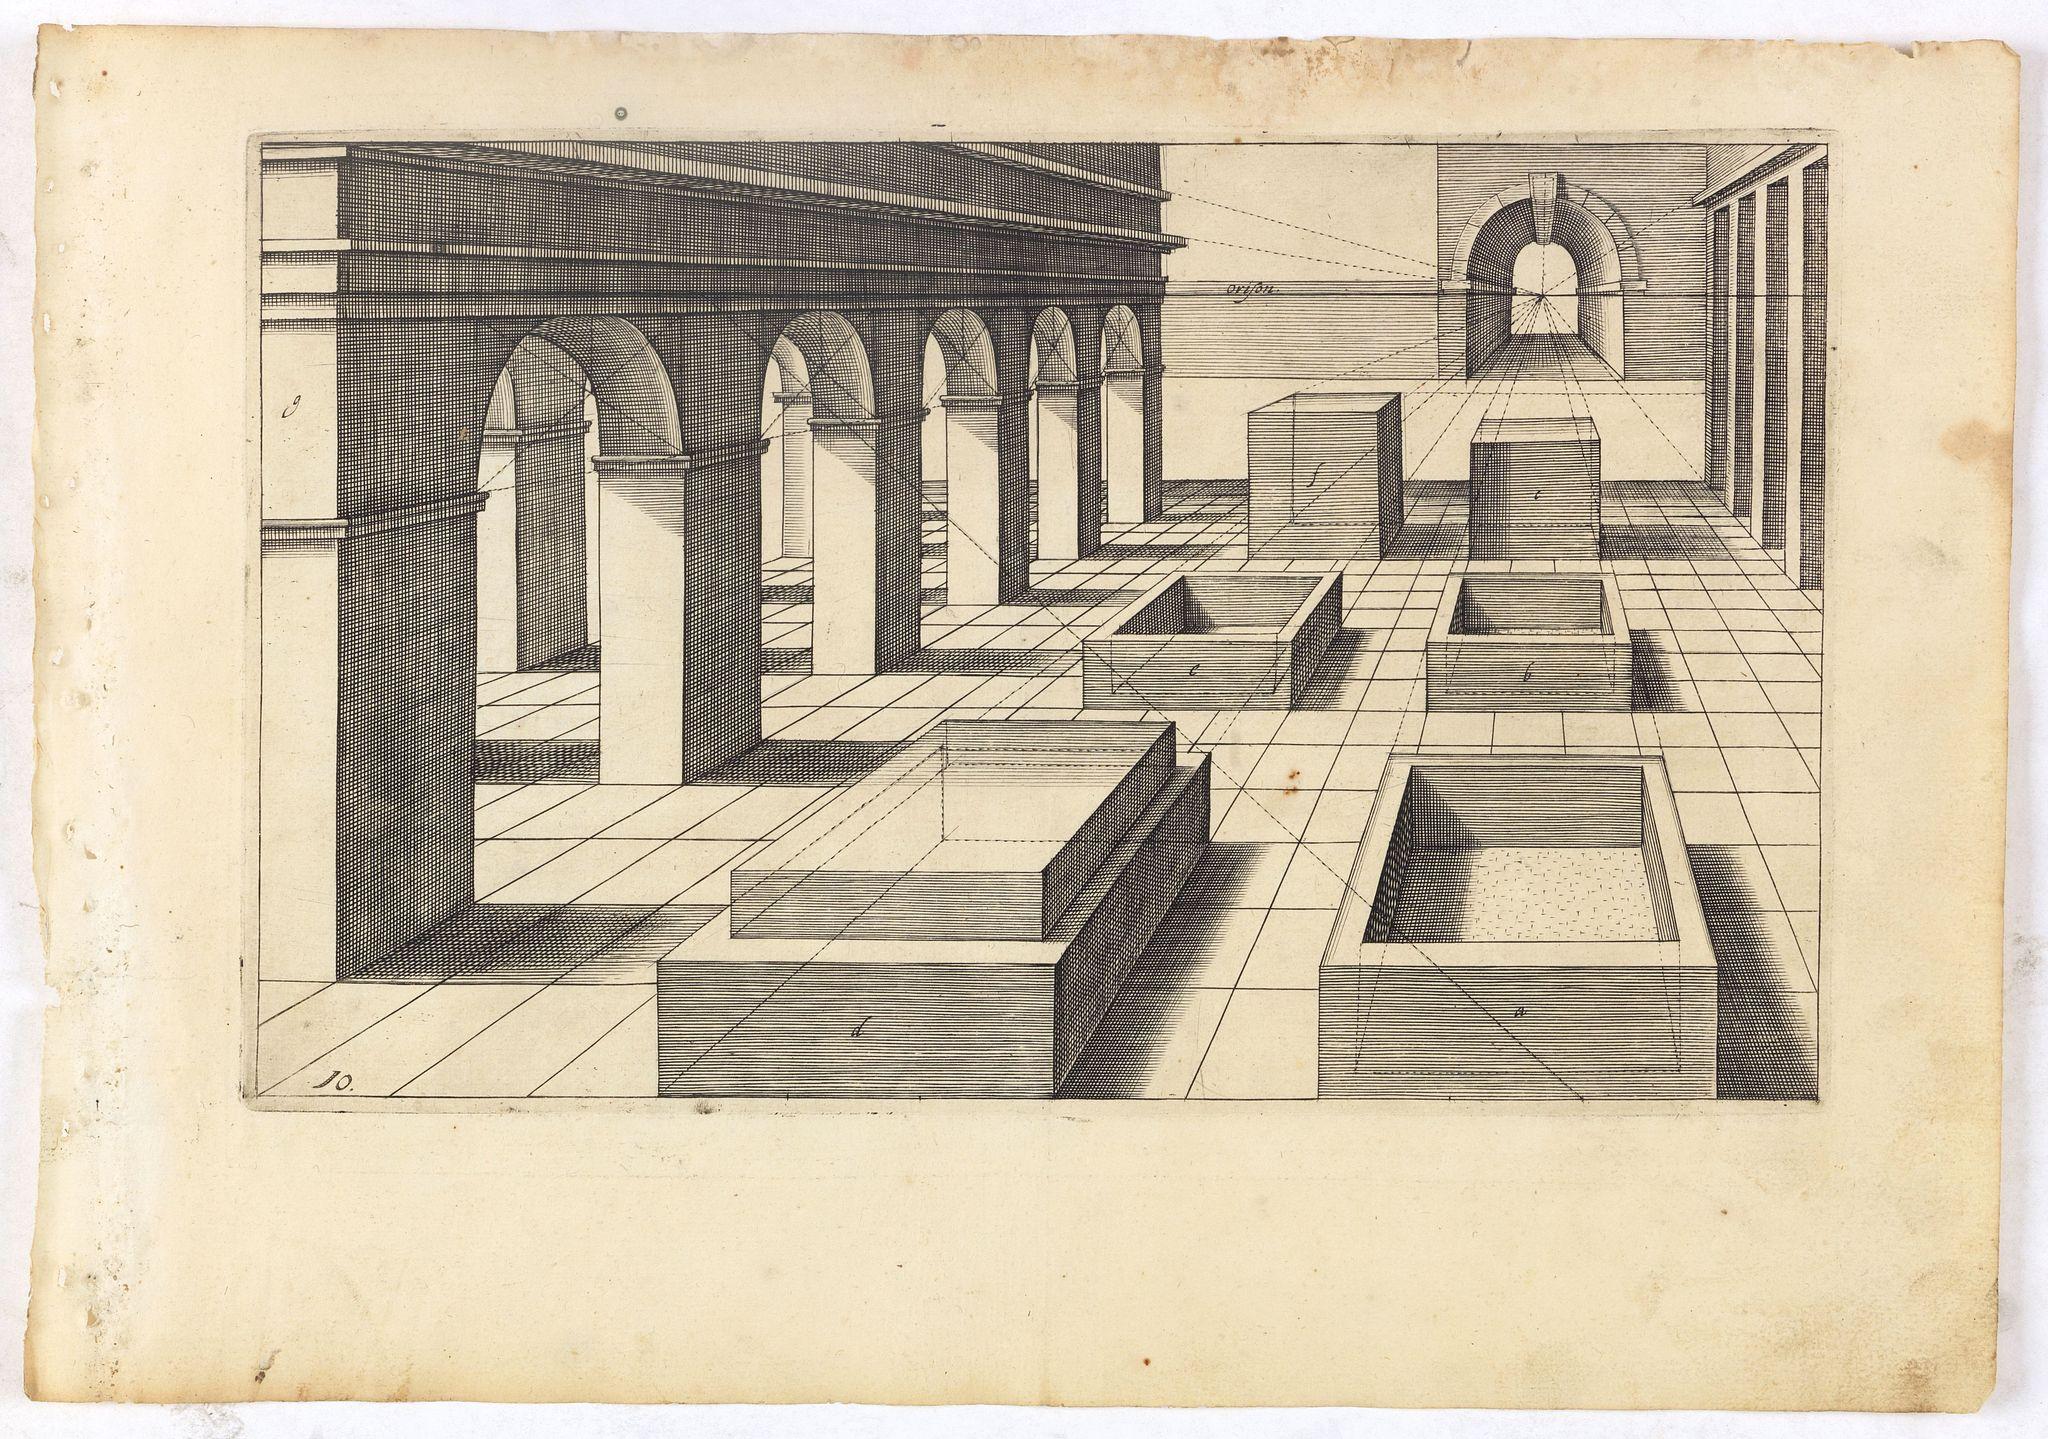 VREDEMAN DE VRIES, J. / HONDIUS, H. -  Perspective print by Vredeman de Vries. 10